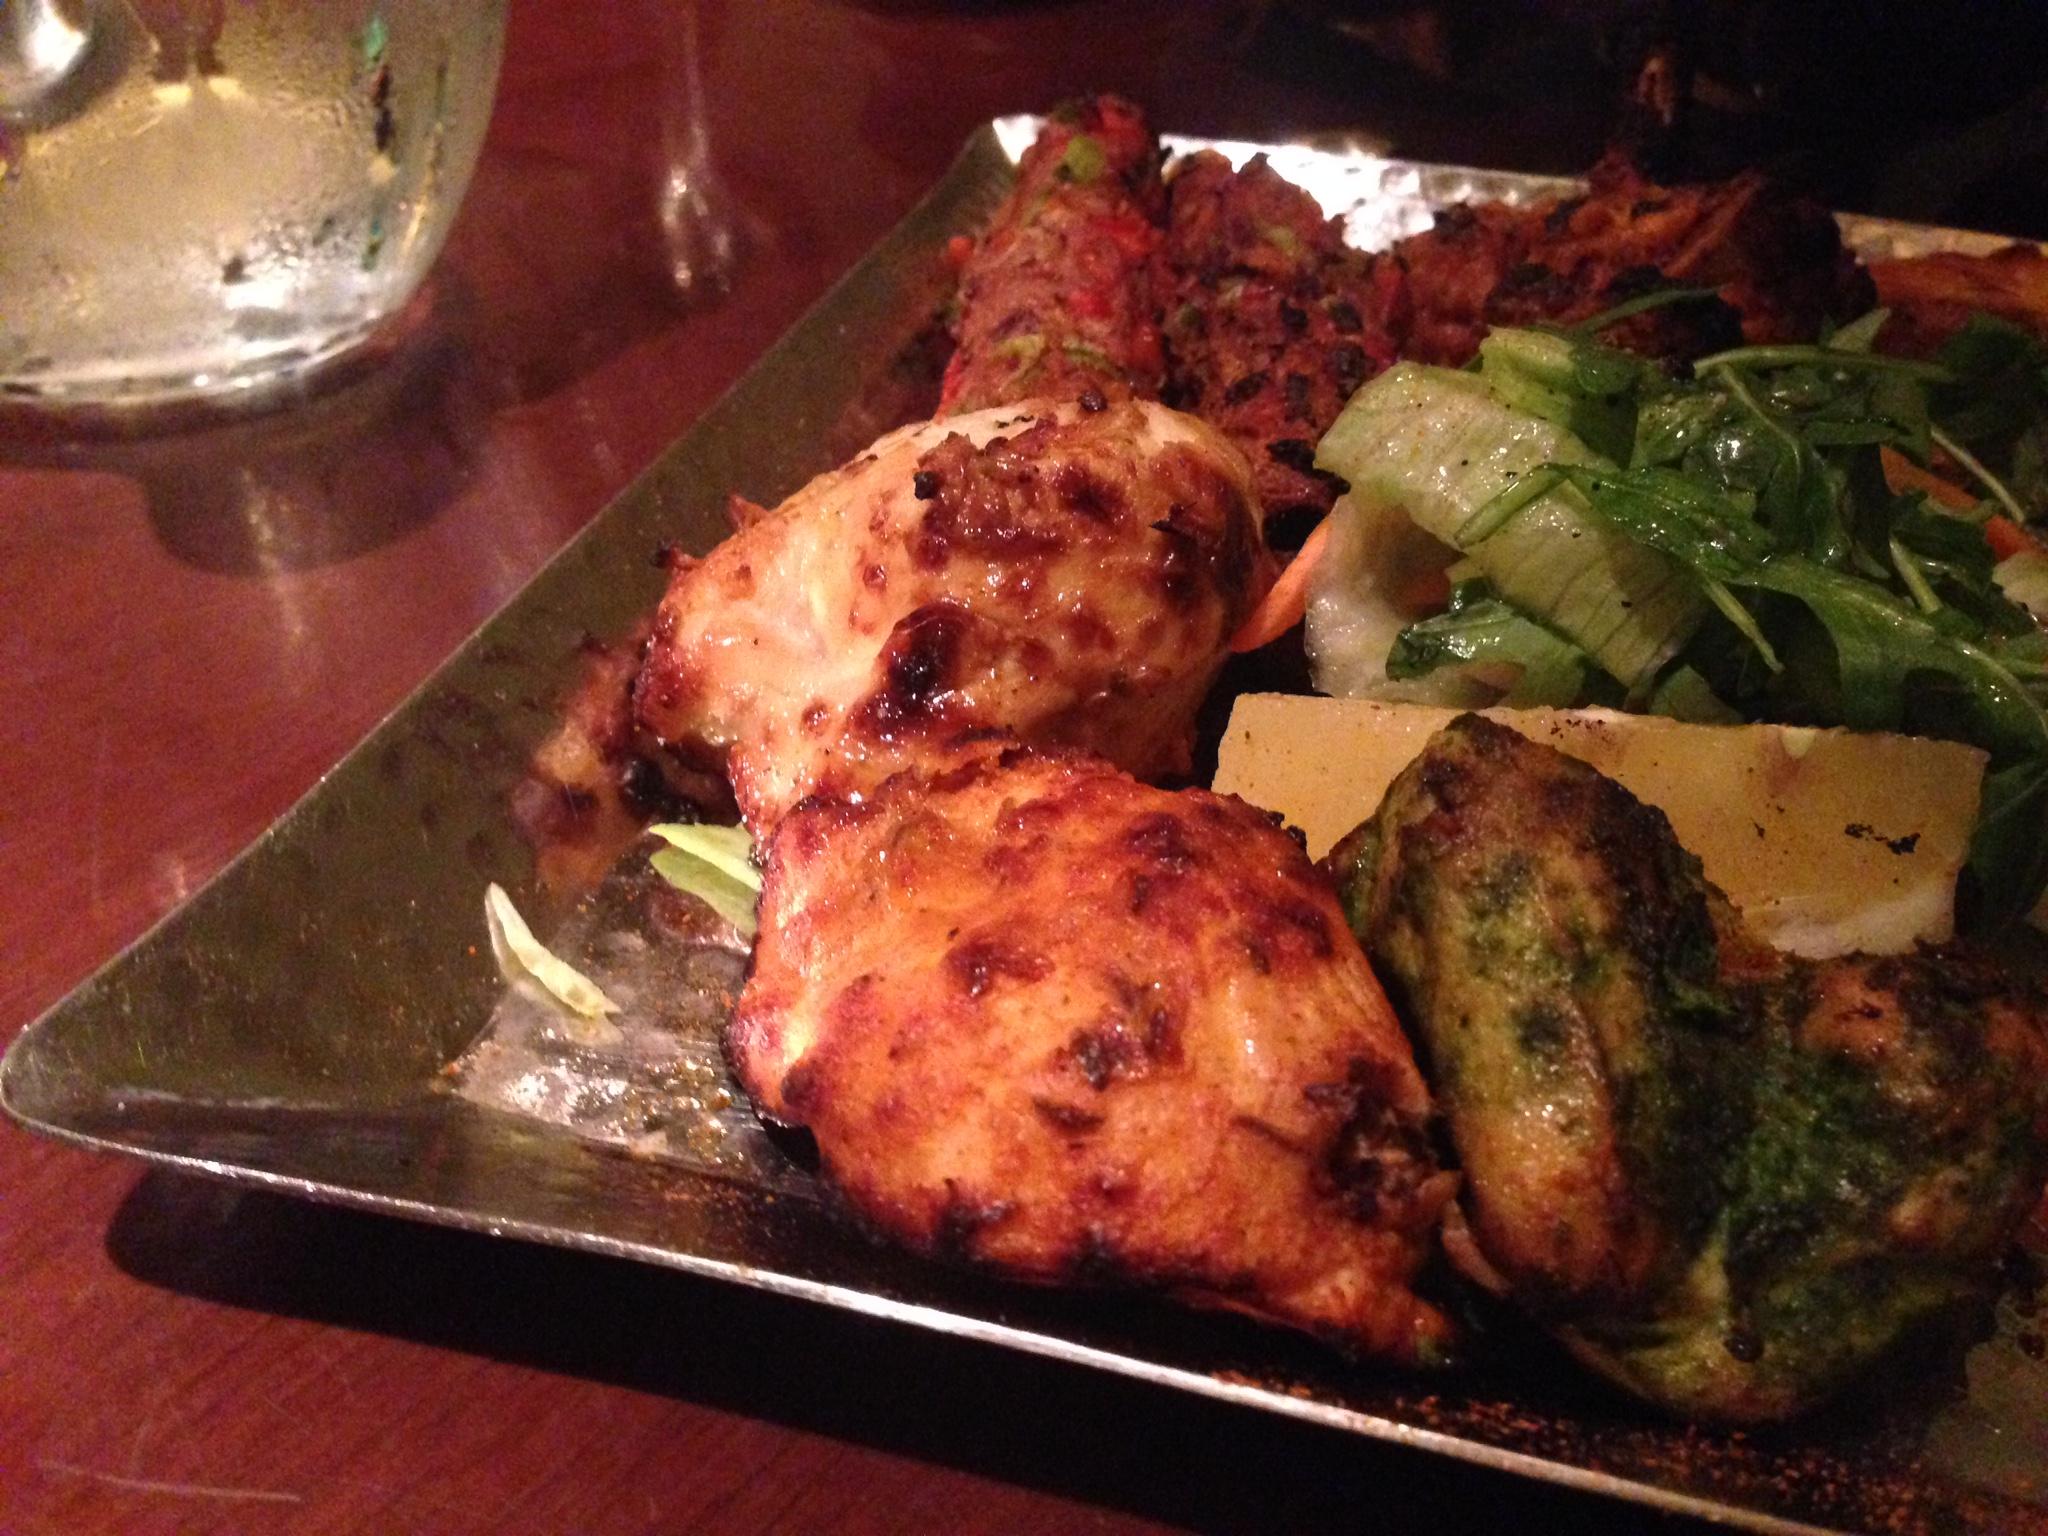 Non vegetarian platter at Potli in London